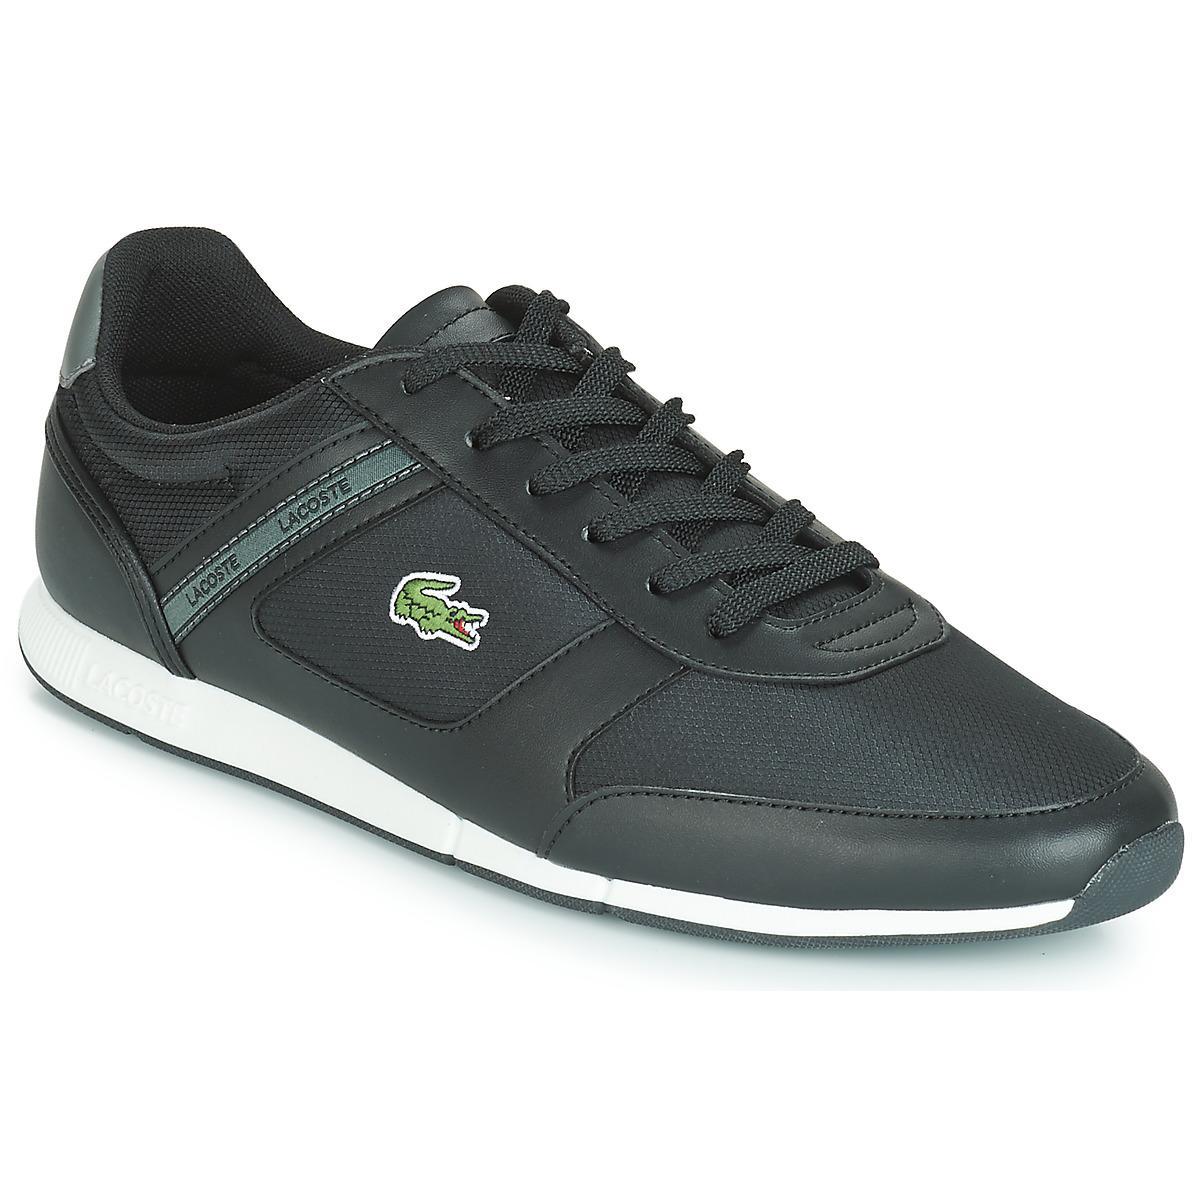 608aeb73b Lacoste Menerva Sport 119 1 Men s Shoes (trainers) In Black in Black ...